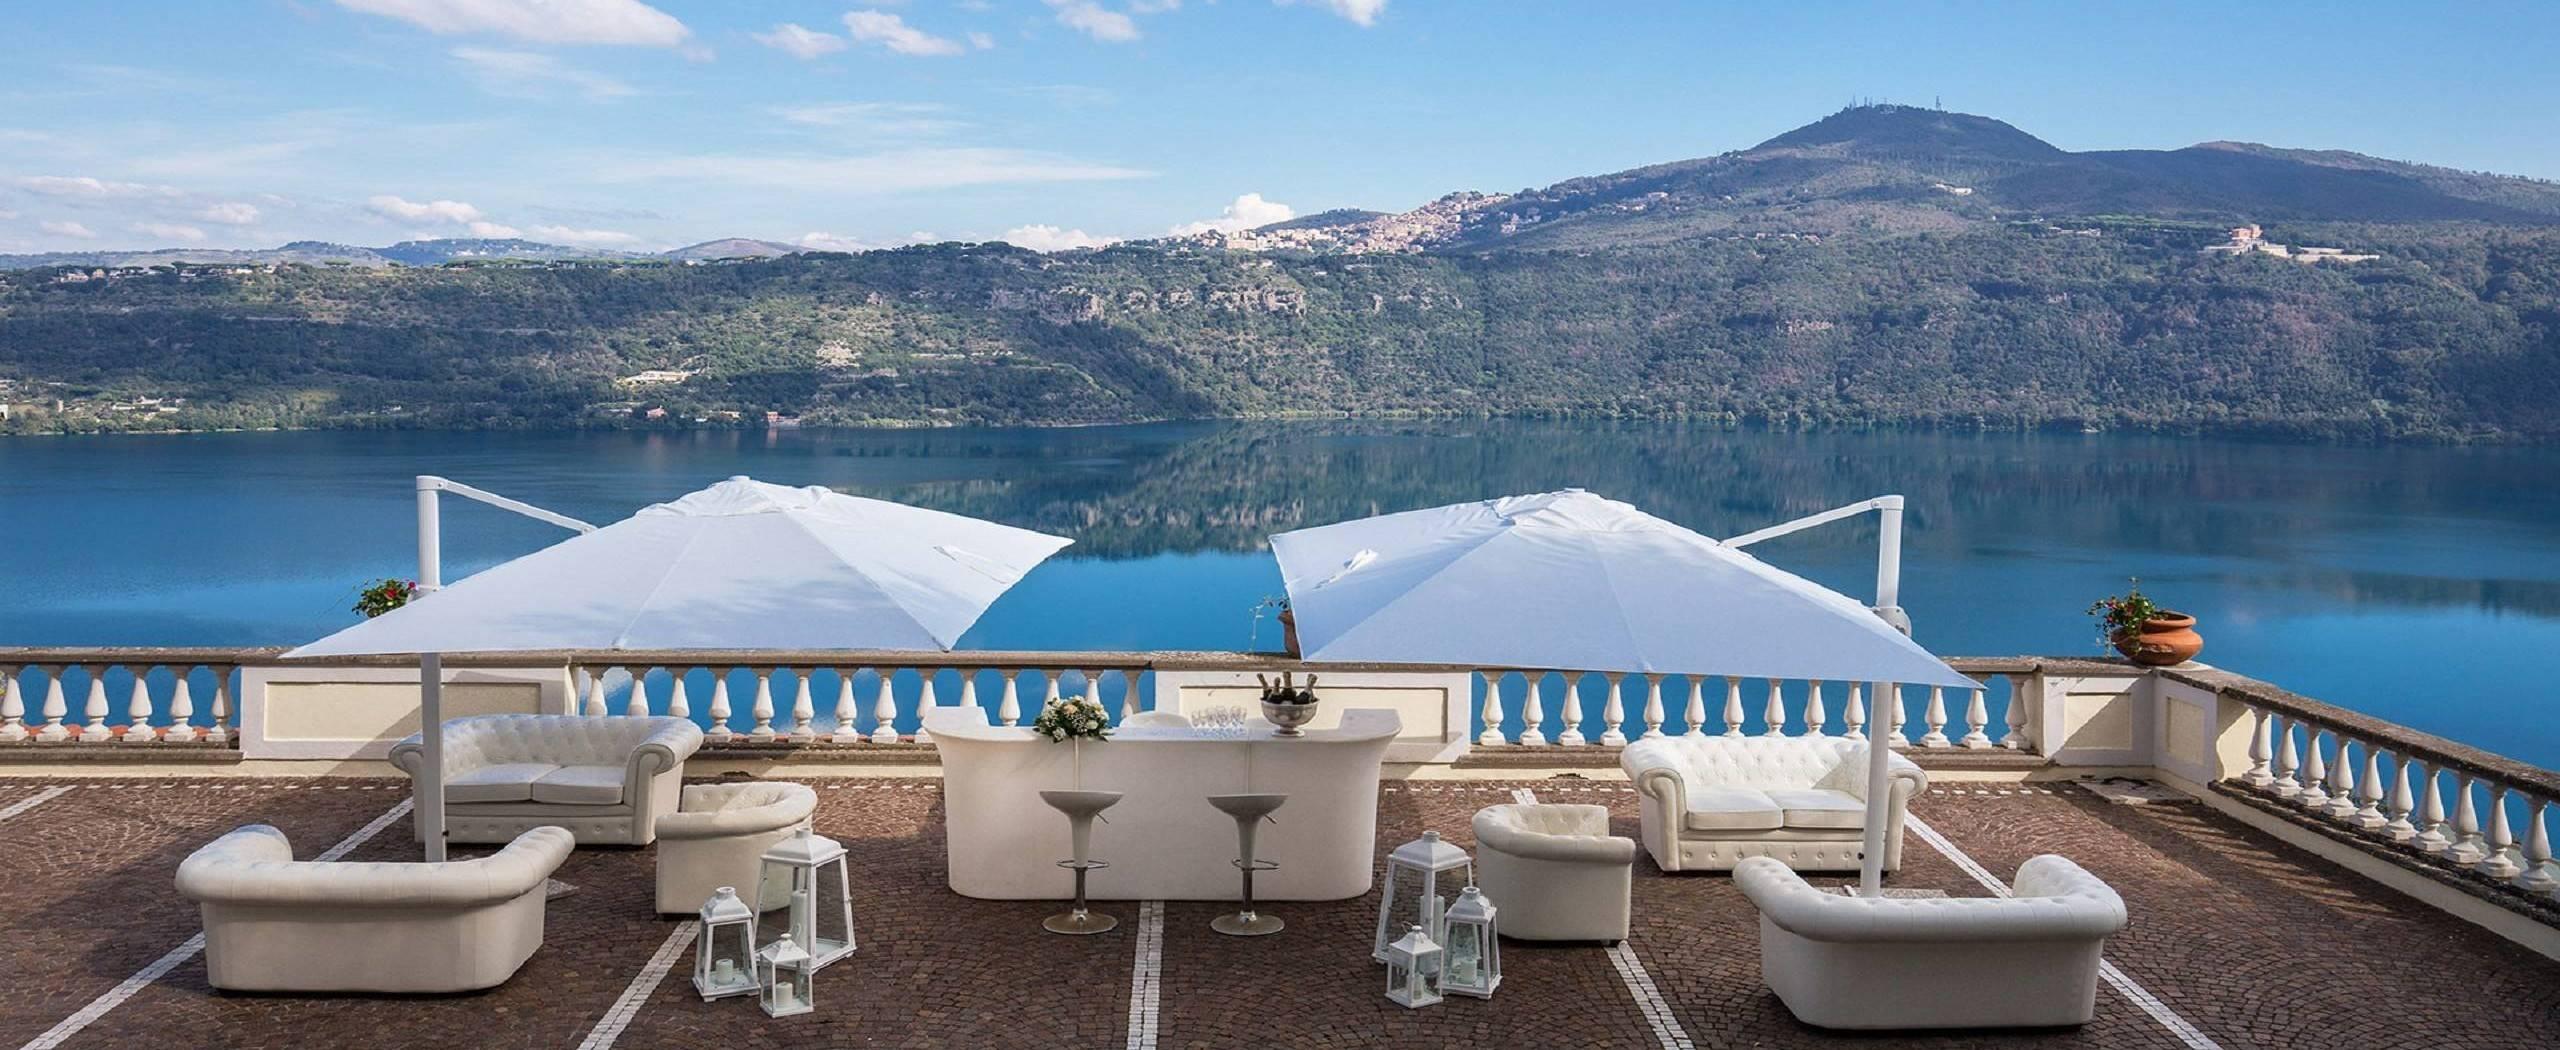 2-Hotel-Castel-Vecchio-Terrazza-Lago-Gazebo-Bis